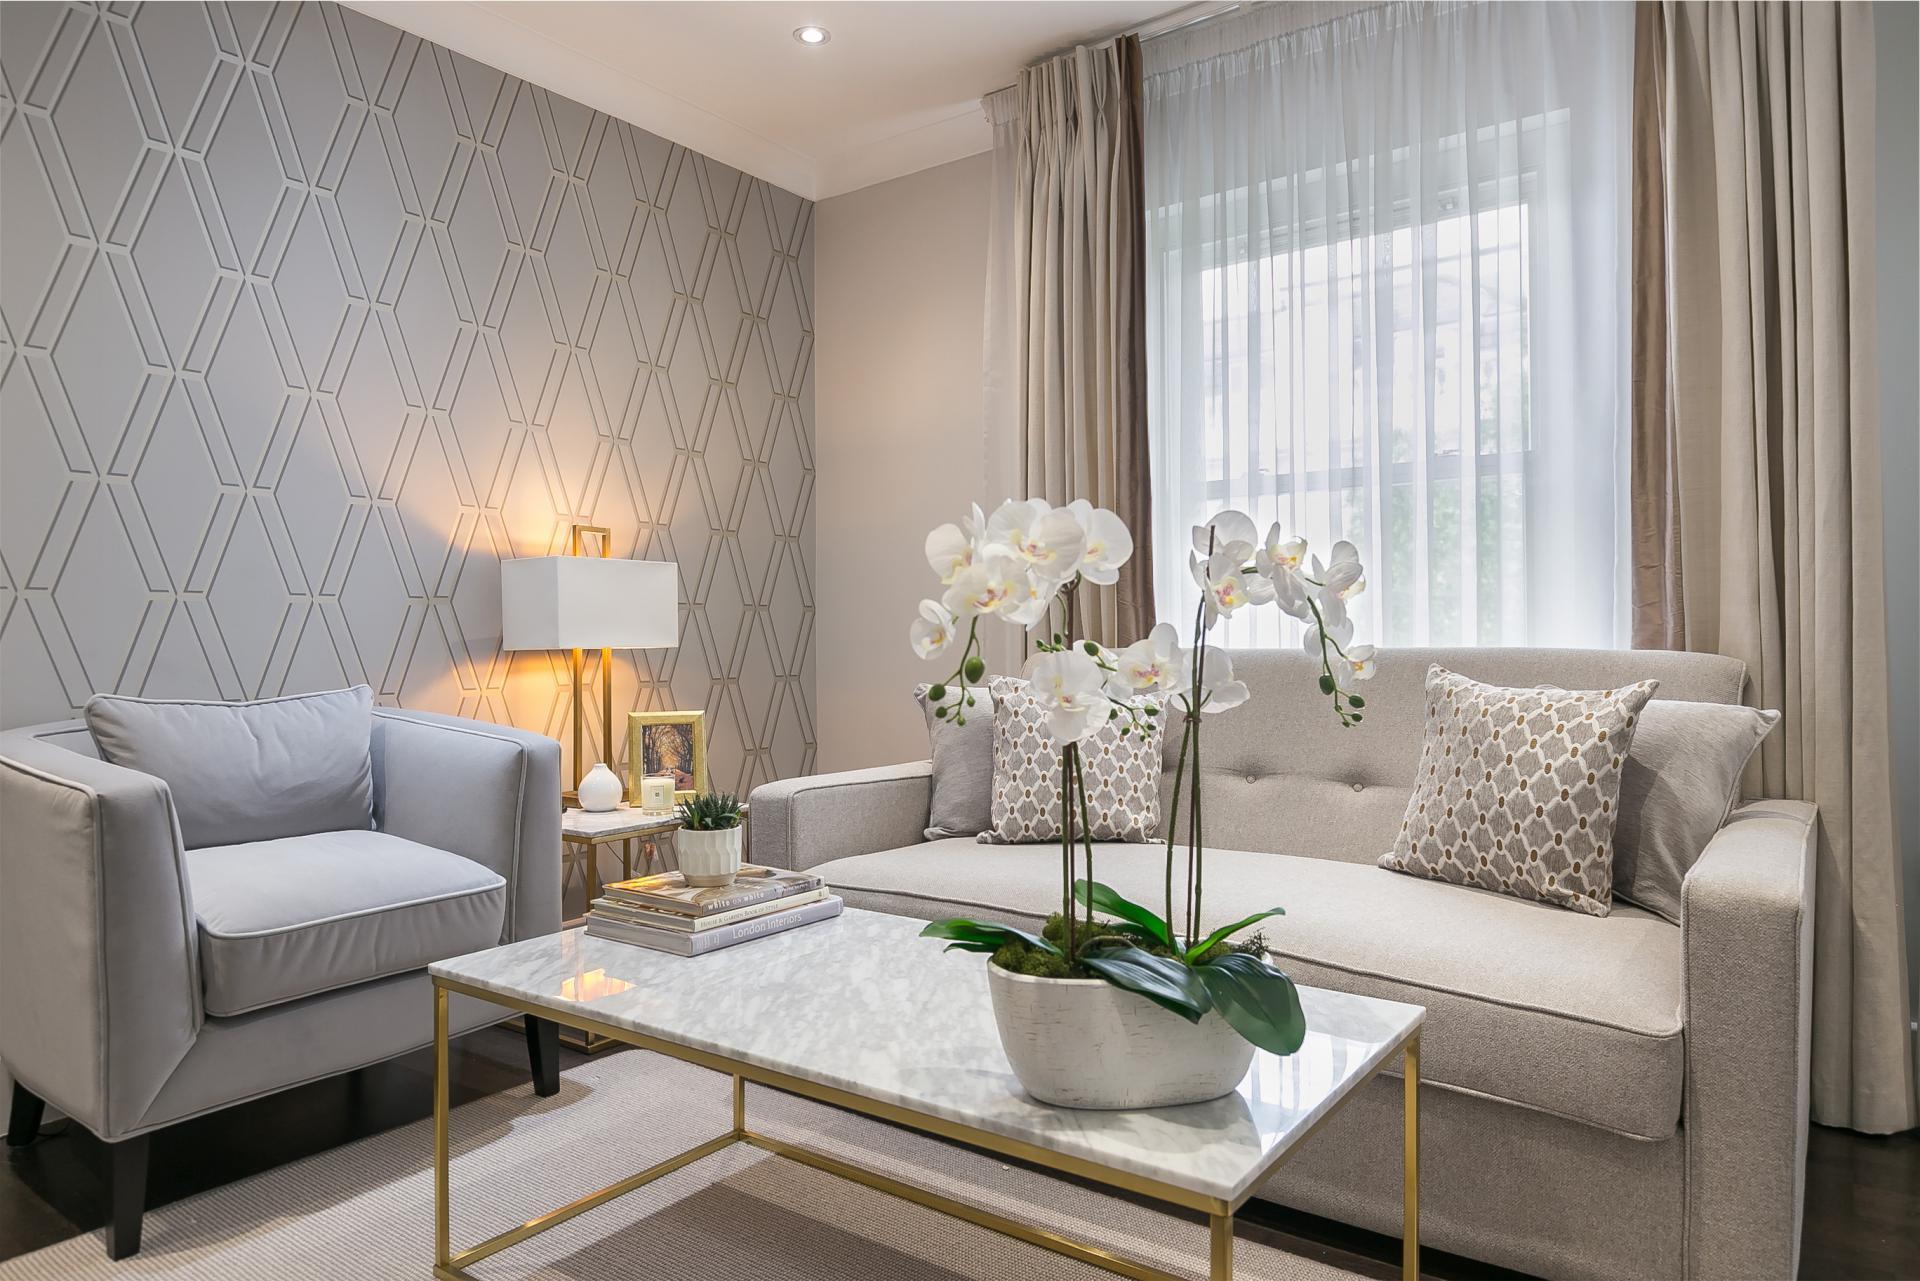 Sofas at Chilworth Court Serviced Apartments, Paddington, London